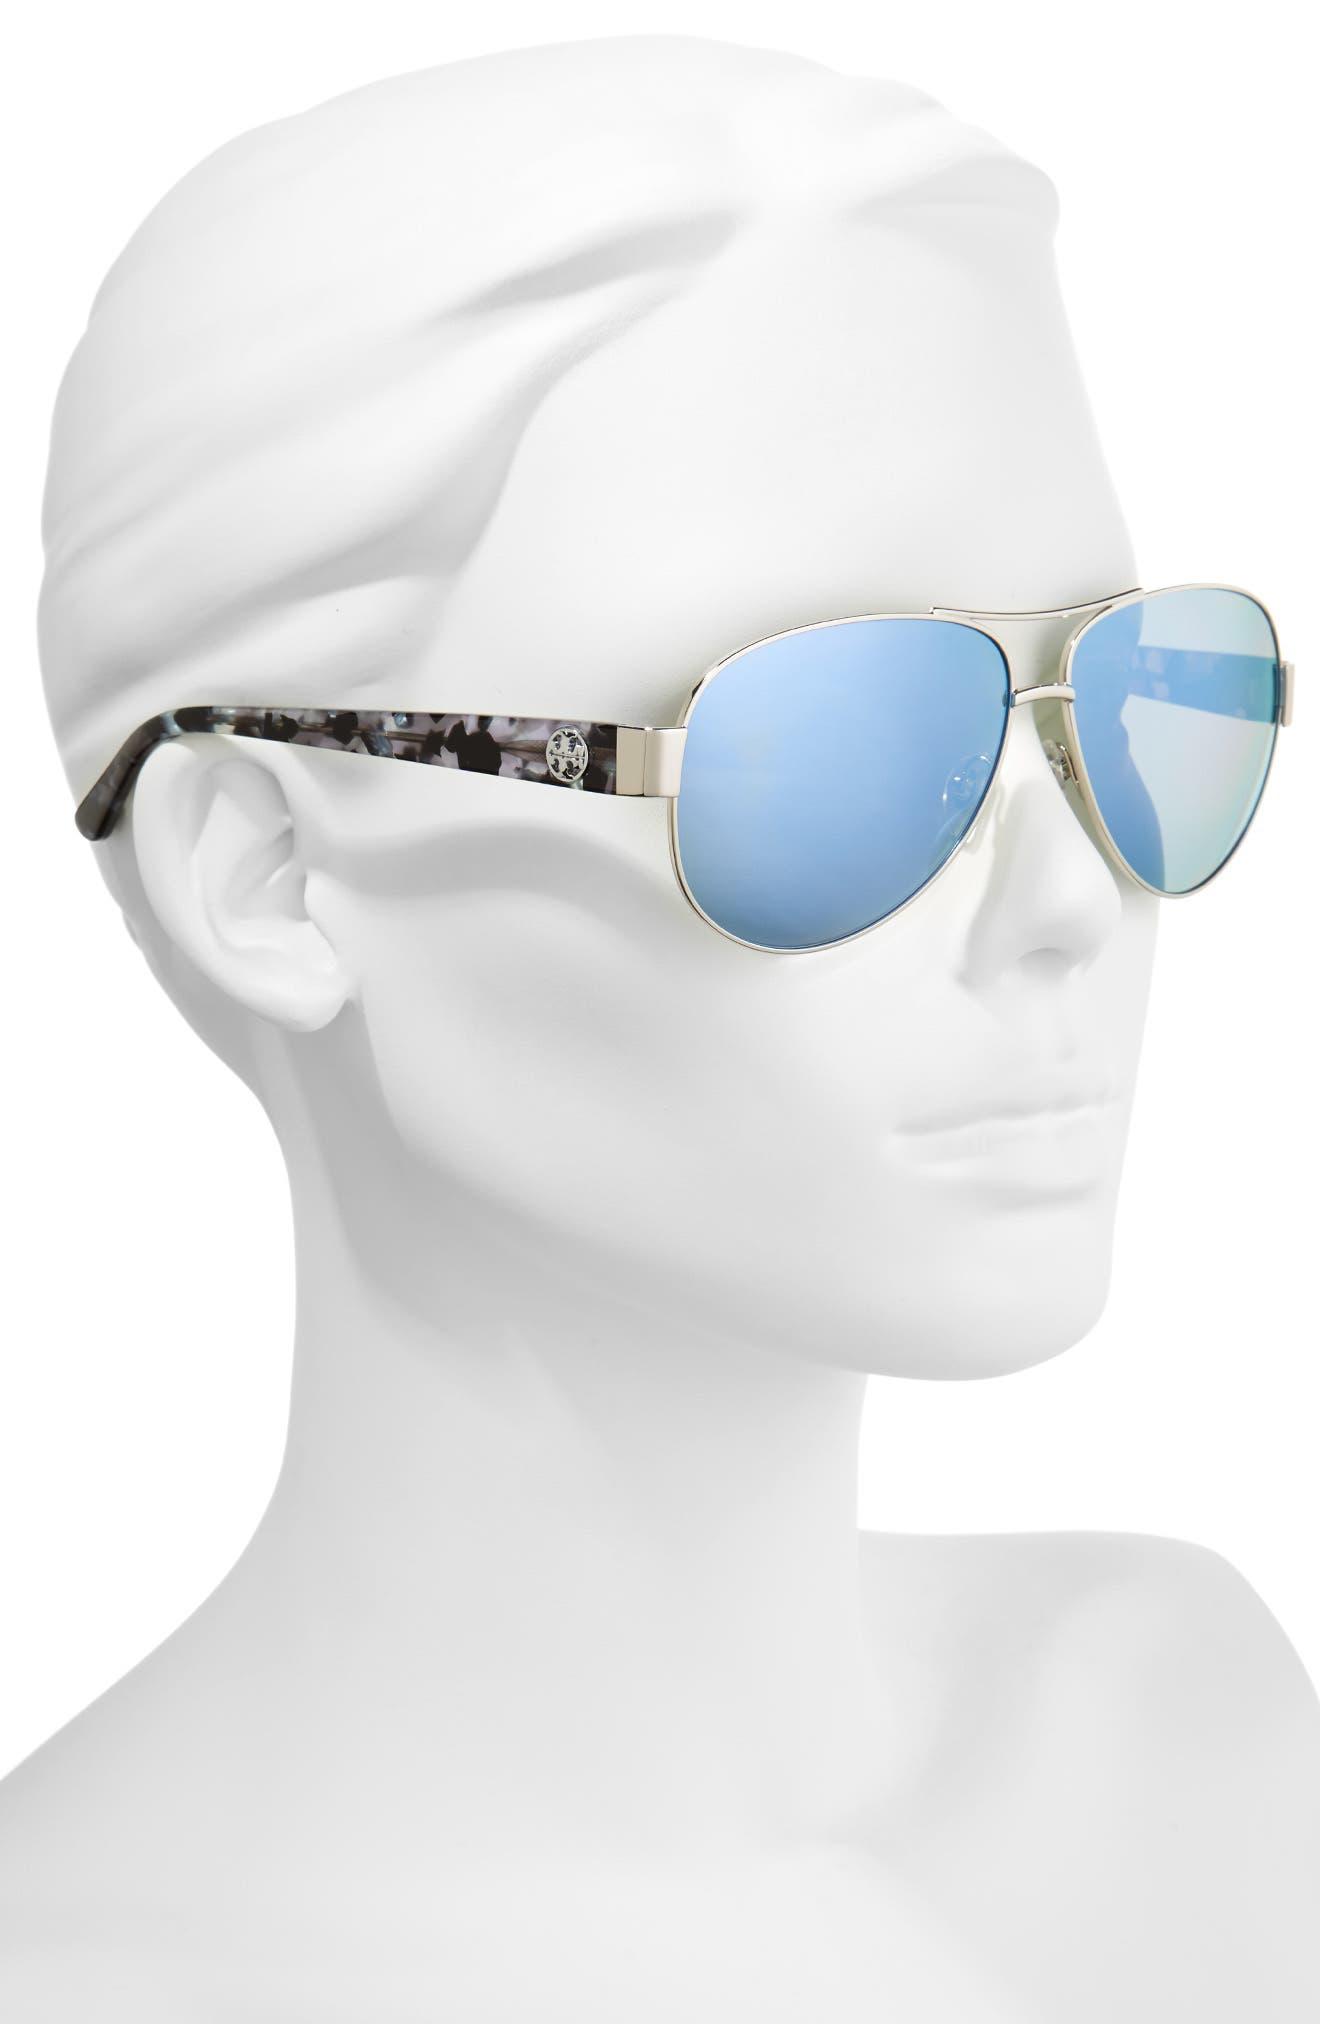 60mm Polarized Aviator Sunglasses,                             Alternate thumbnail 2, color,                             040